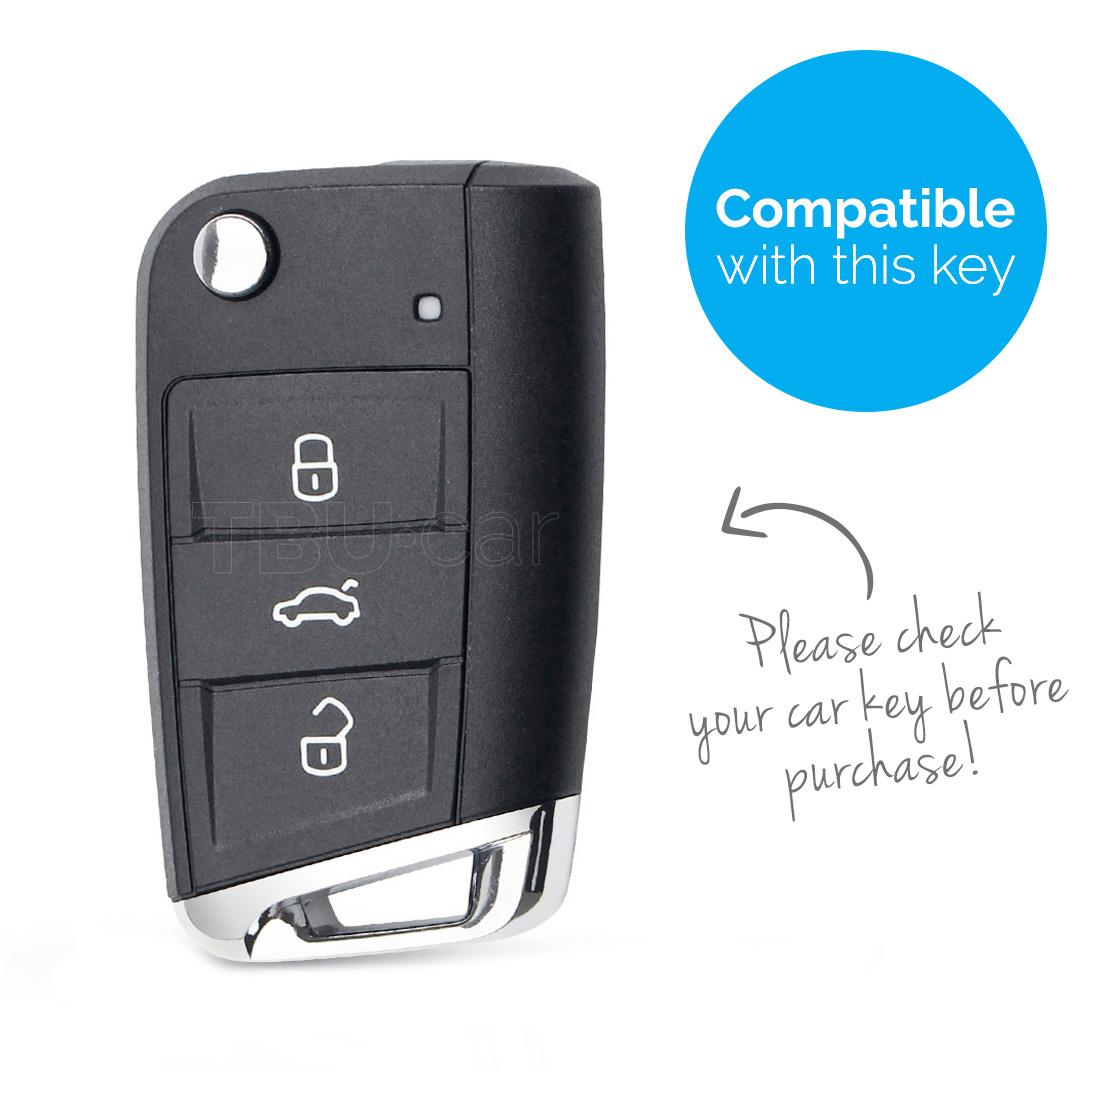 TBU car Autoschlüssel Hülle für Seat 3 Tasten - Schutzhülle aus Silikon - Auto Schlüsselhülle Cover in Lindgrün